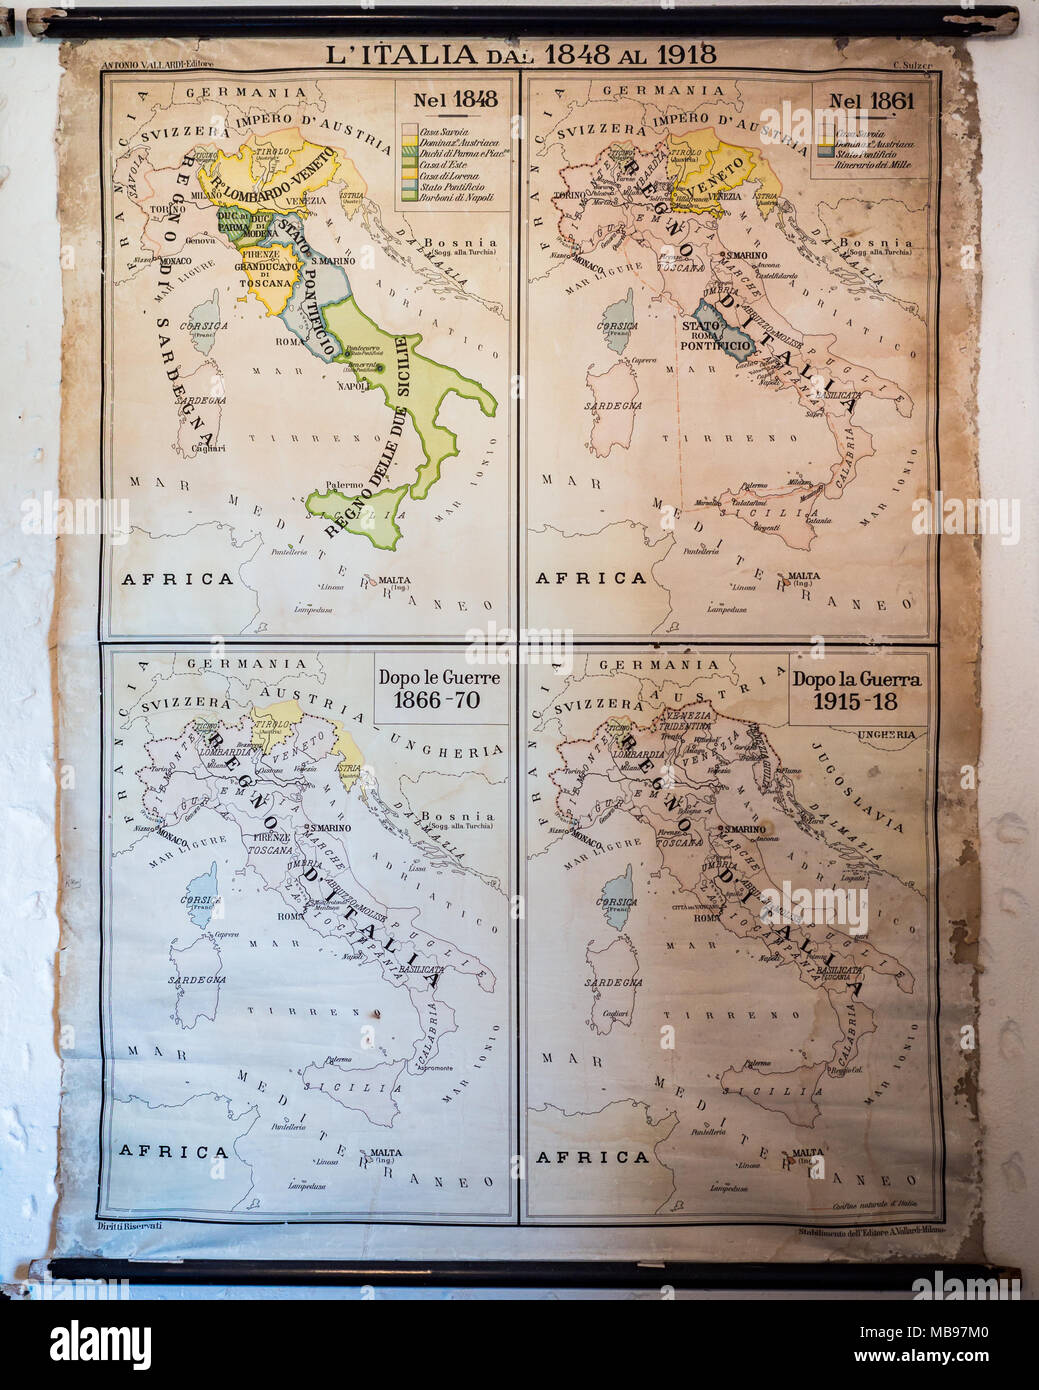 Cartina Geografica Italia Africa.Vecchia Cartina Geografica Di Italia Con I Confini Da 1848 A 1918 Foto Stock Alamy